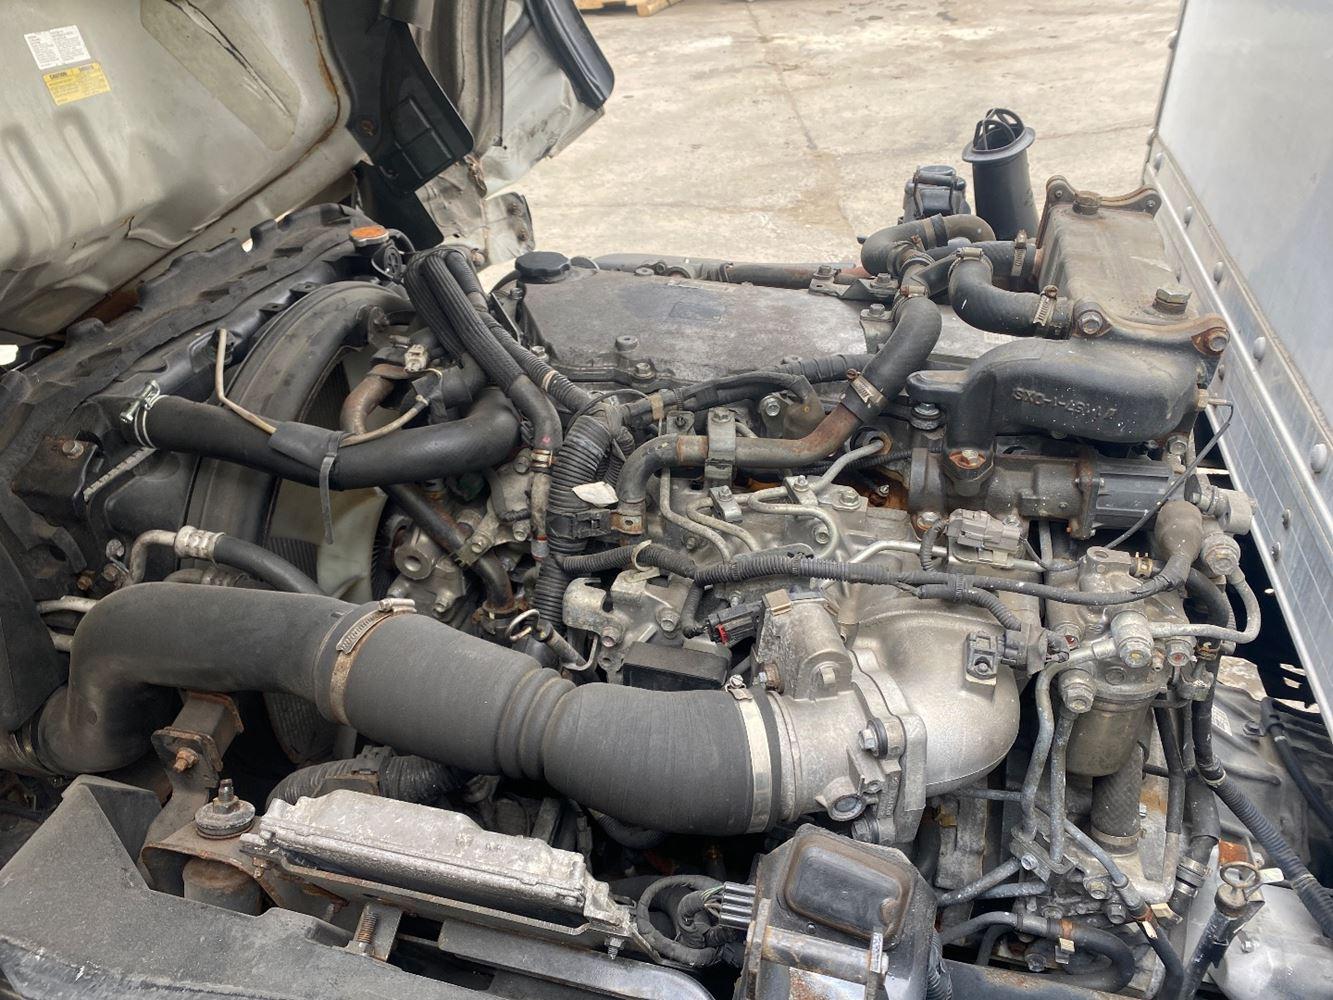 2011 ISUZU 4HK1-TC ENGINE ASSEMBLY TRUCK PARTS #721514